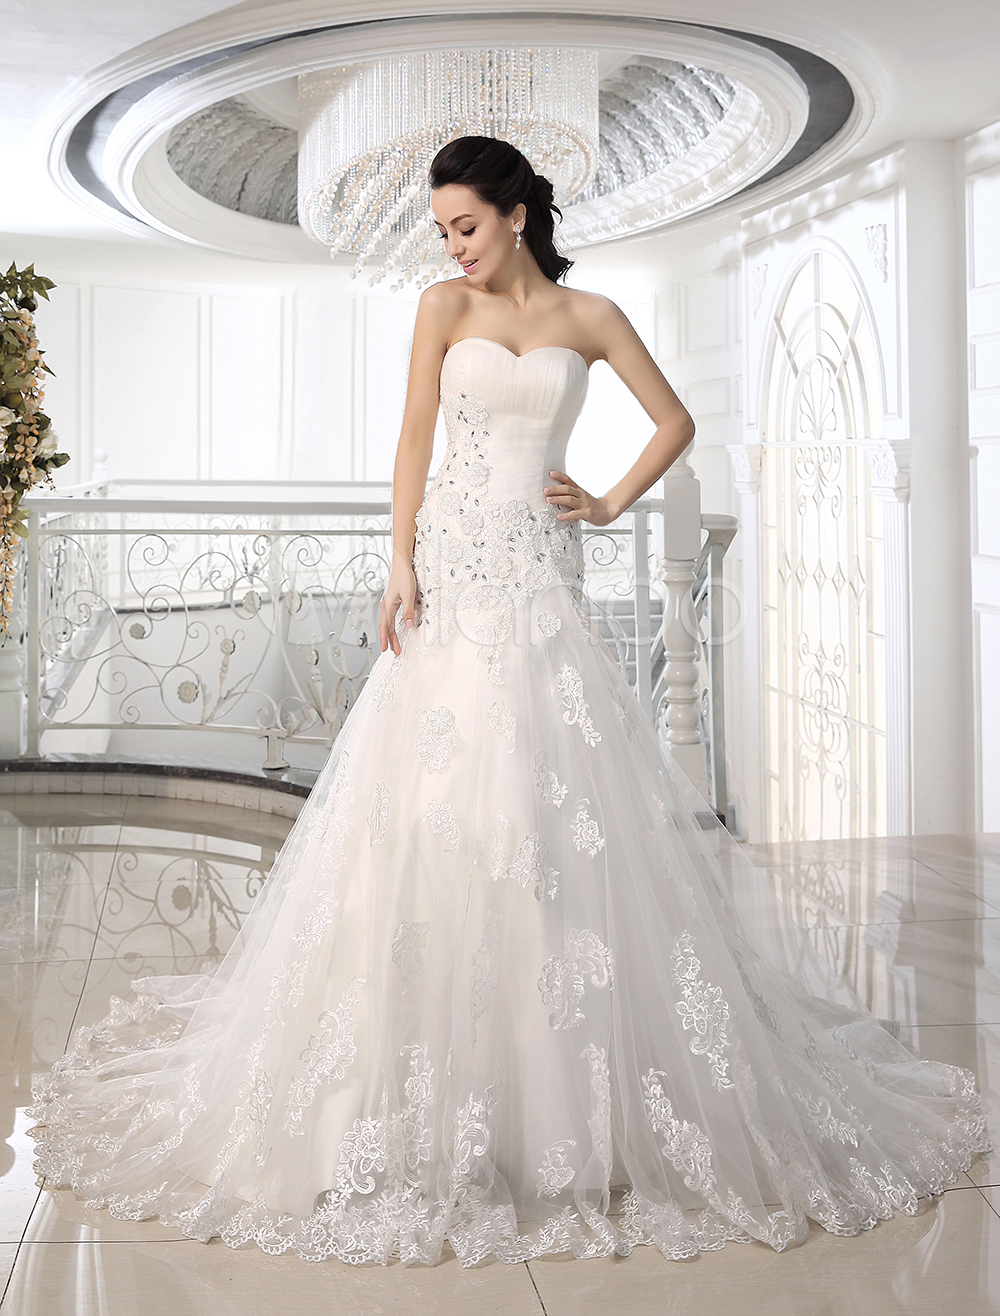 Strapless Wedding Dresses Mermaid Lace Applique fishtail Bridal Gown Rhinestones Dropped Waist Court Train Bridal Dress